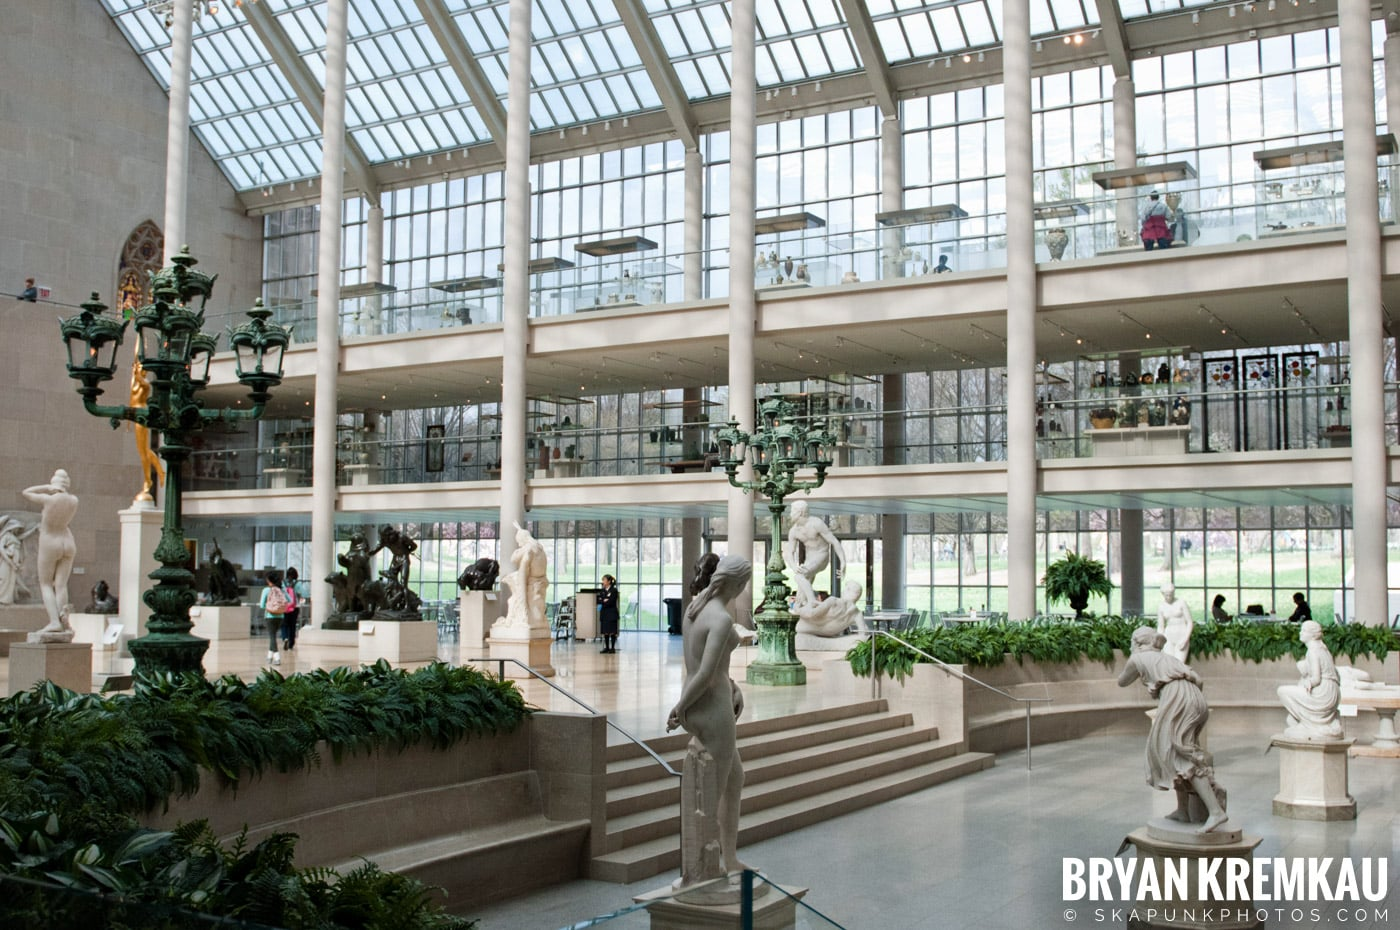 The Metropolitan Museum of Art and Shake Shack @ New York, NY - 3.24.12 (44)